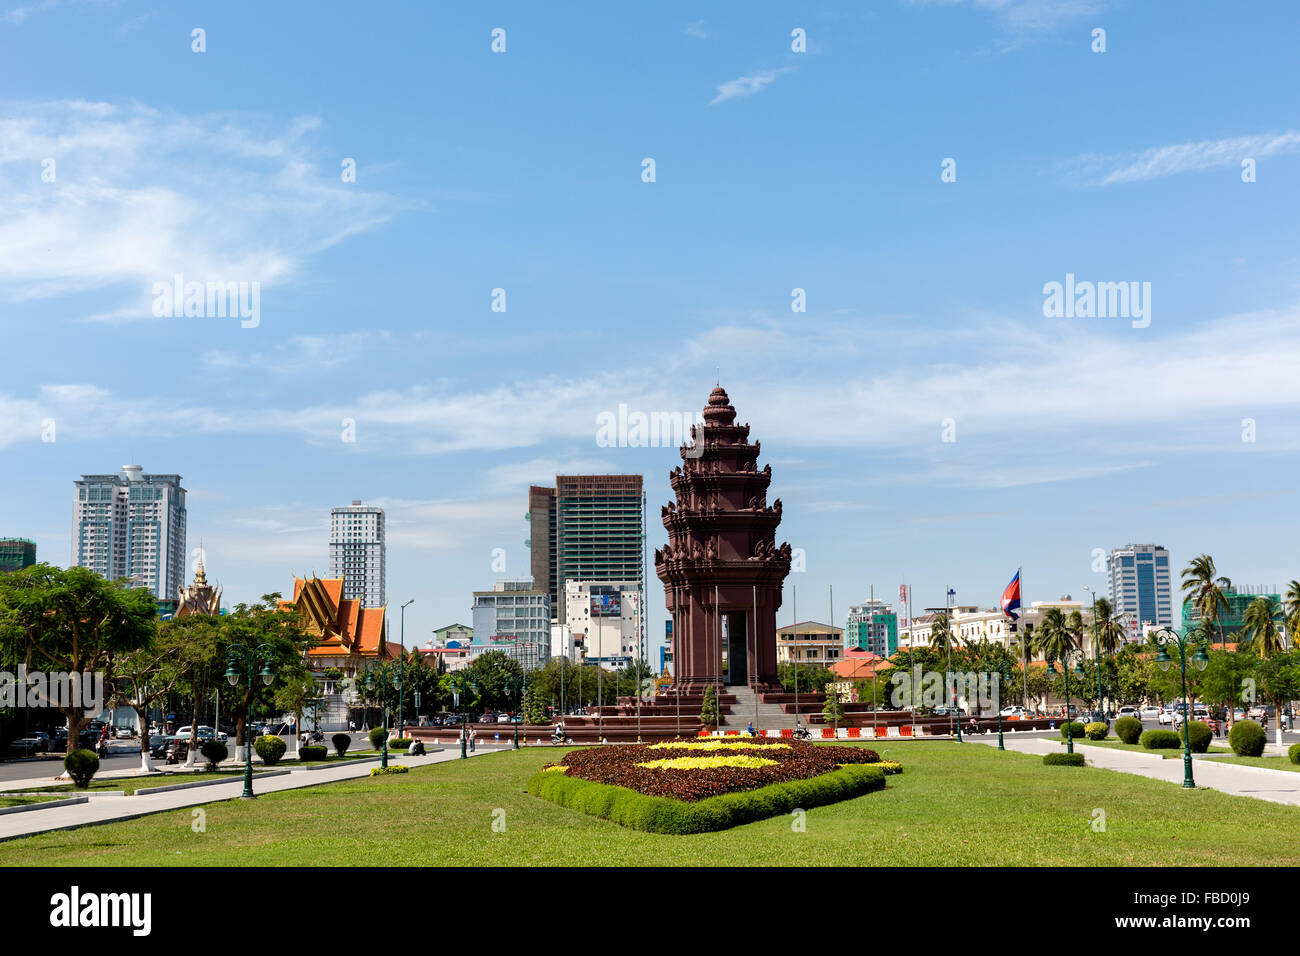 Independence Monument on Sihanouk Boulevard, Neak Banh Teuk Park avenue, Phnom Penh, Cambodia Stock Photo